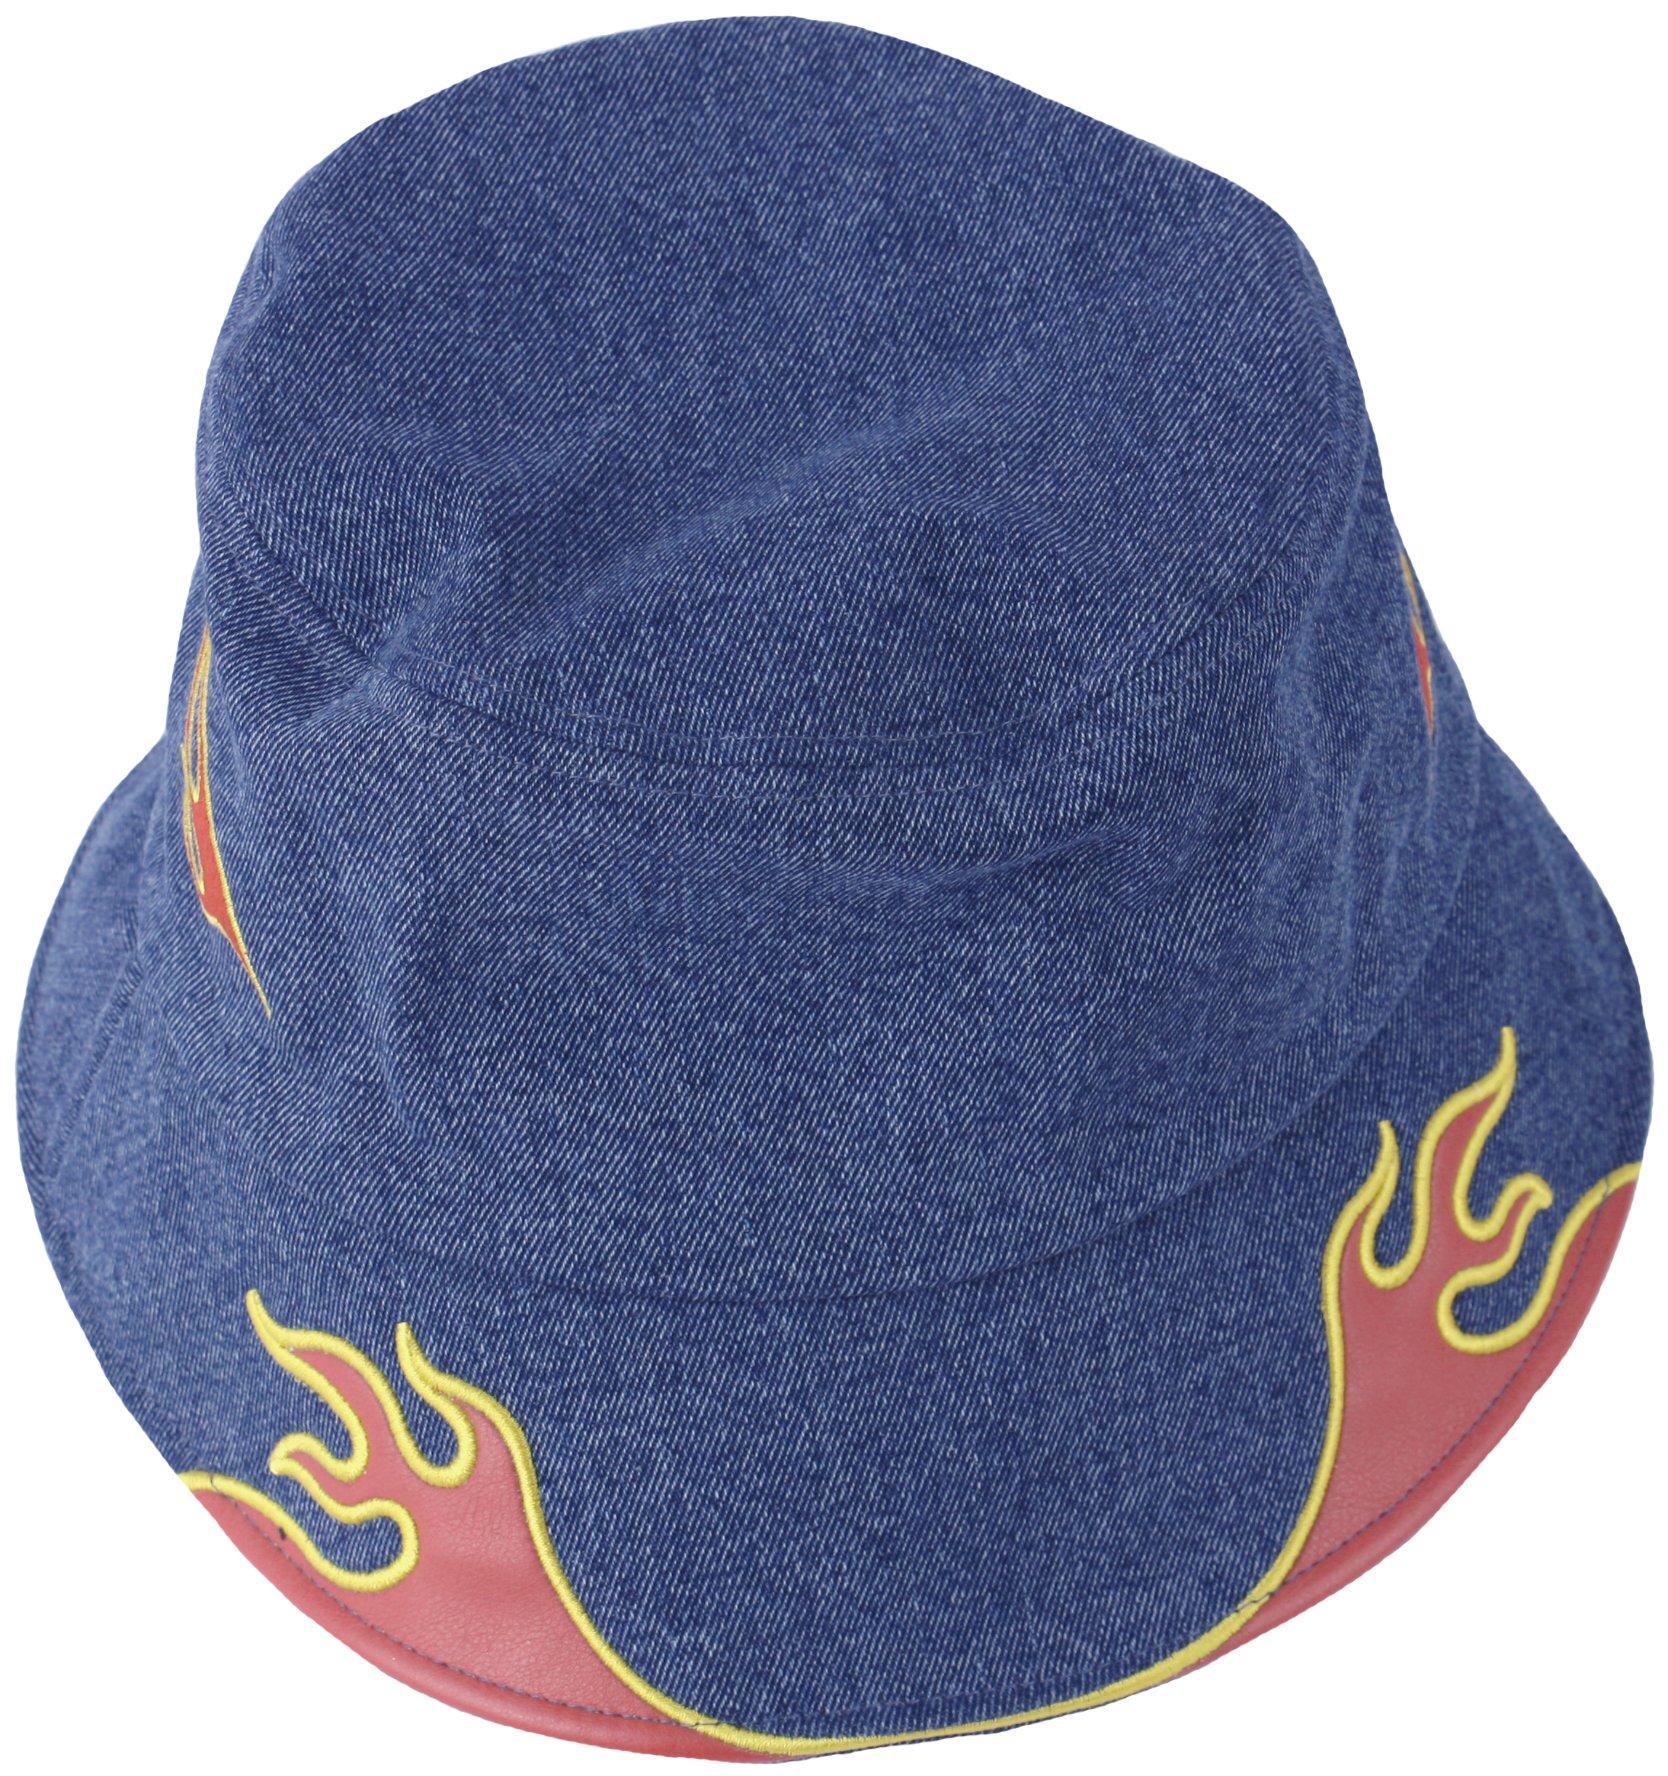 RaOn S20 New Flame Effect Style Sun Visor Wide Brim Foldable UV Protect Hat Beach Cap (Denim)